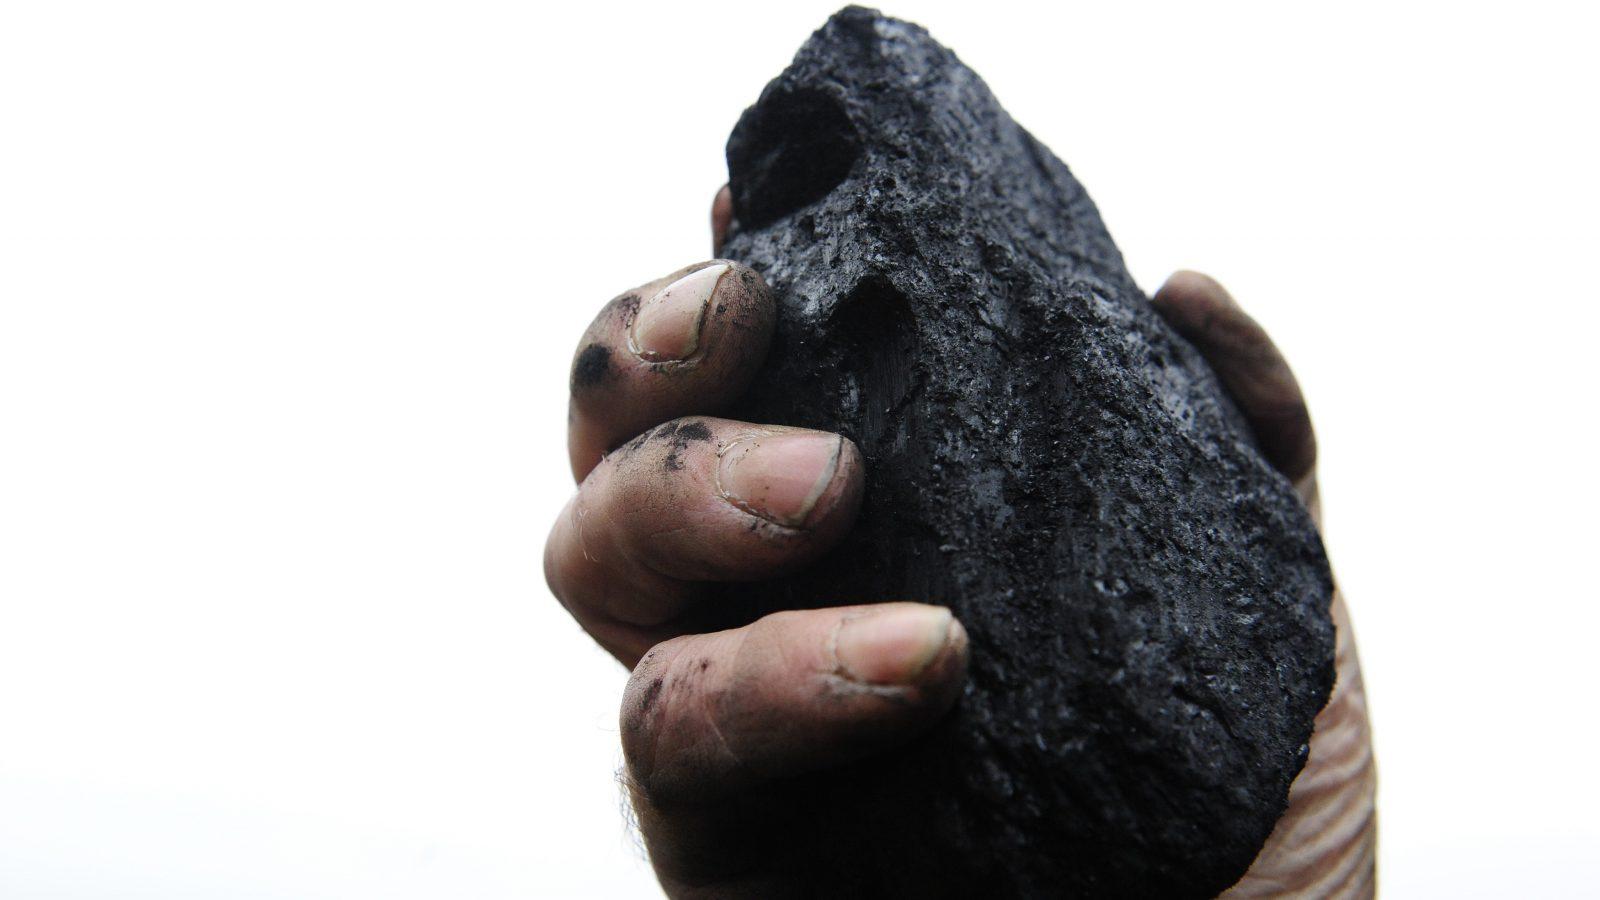 A coal merchant holds up a lump of coal.